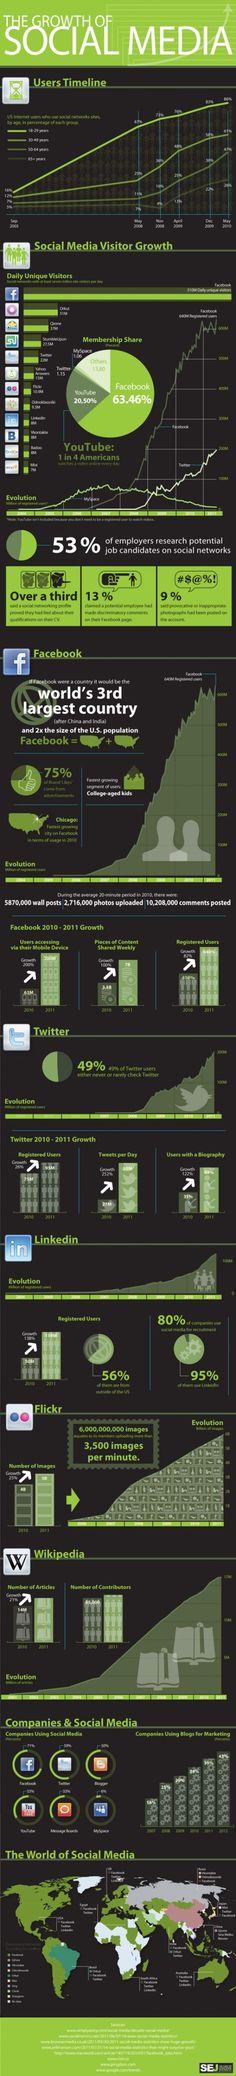 Social media evolution infographic